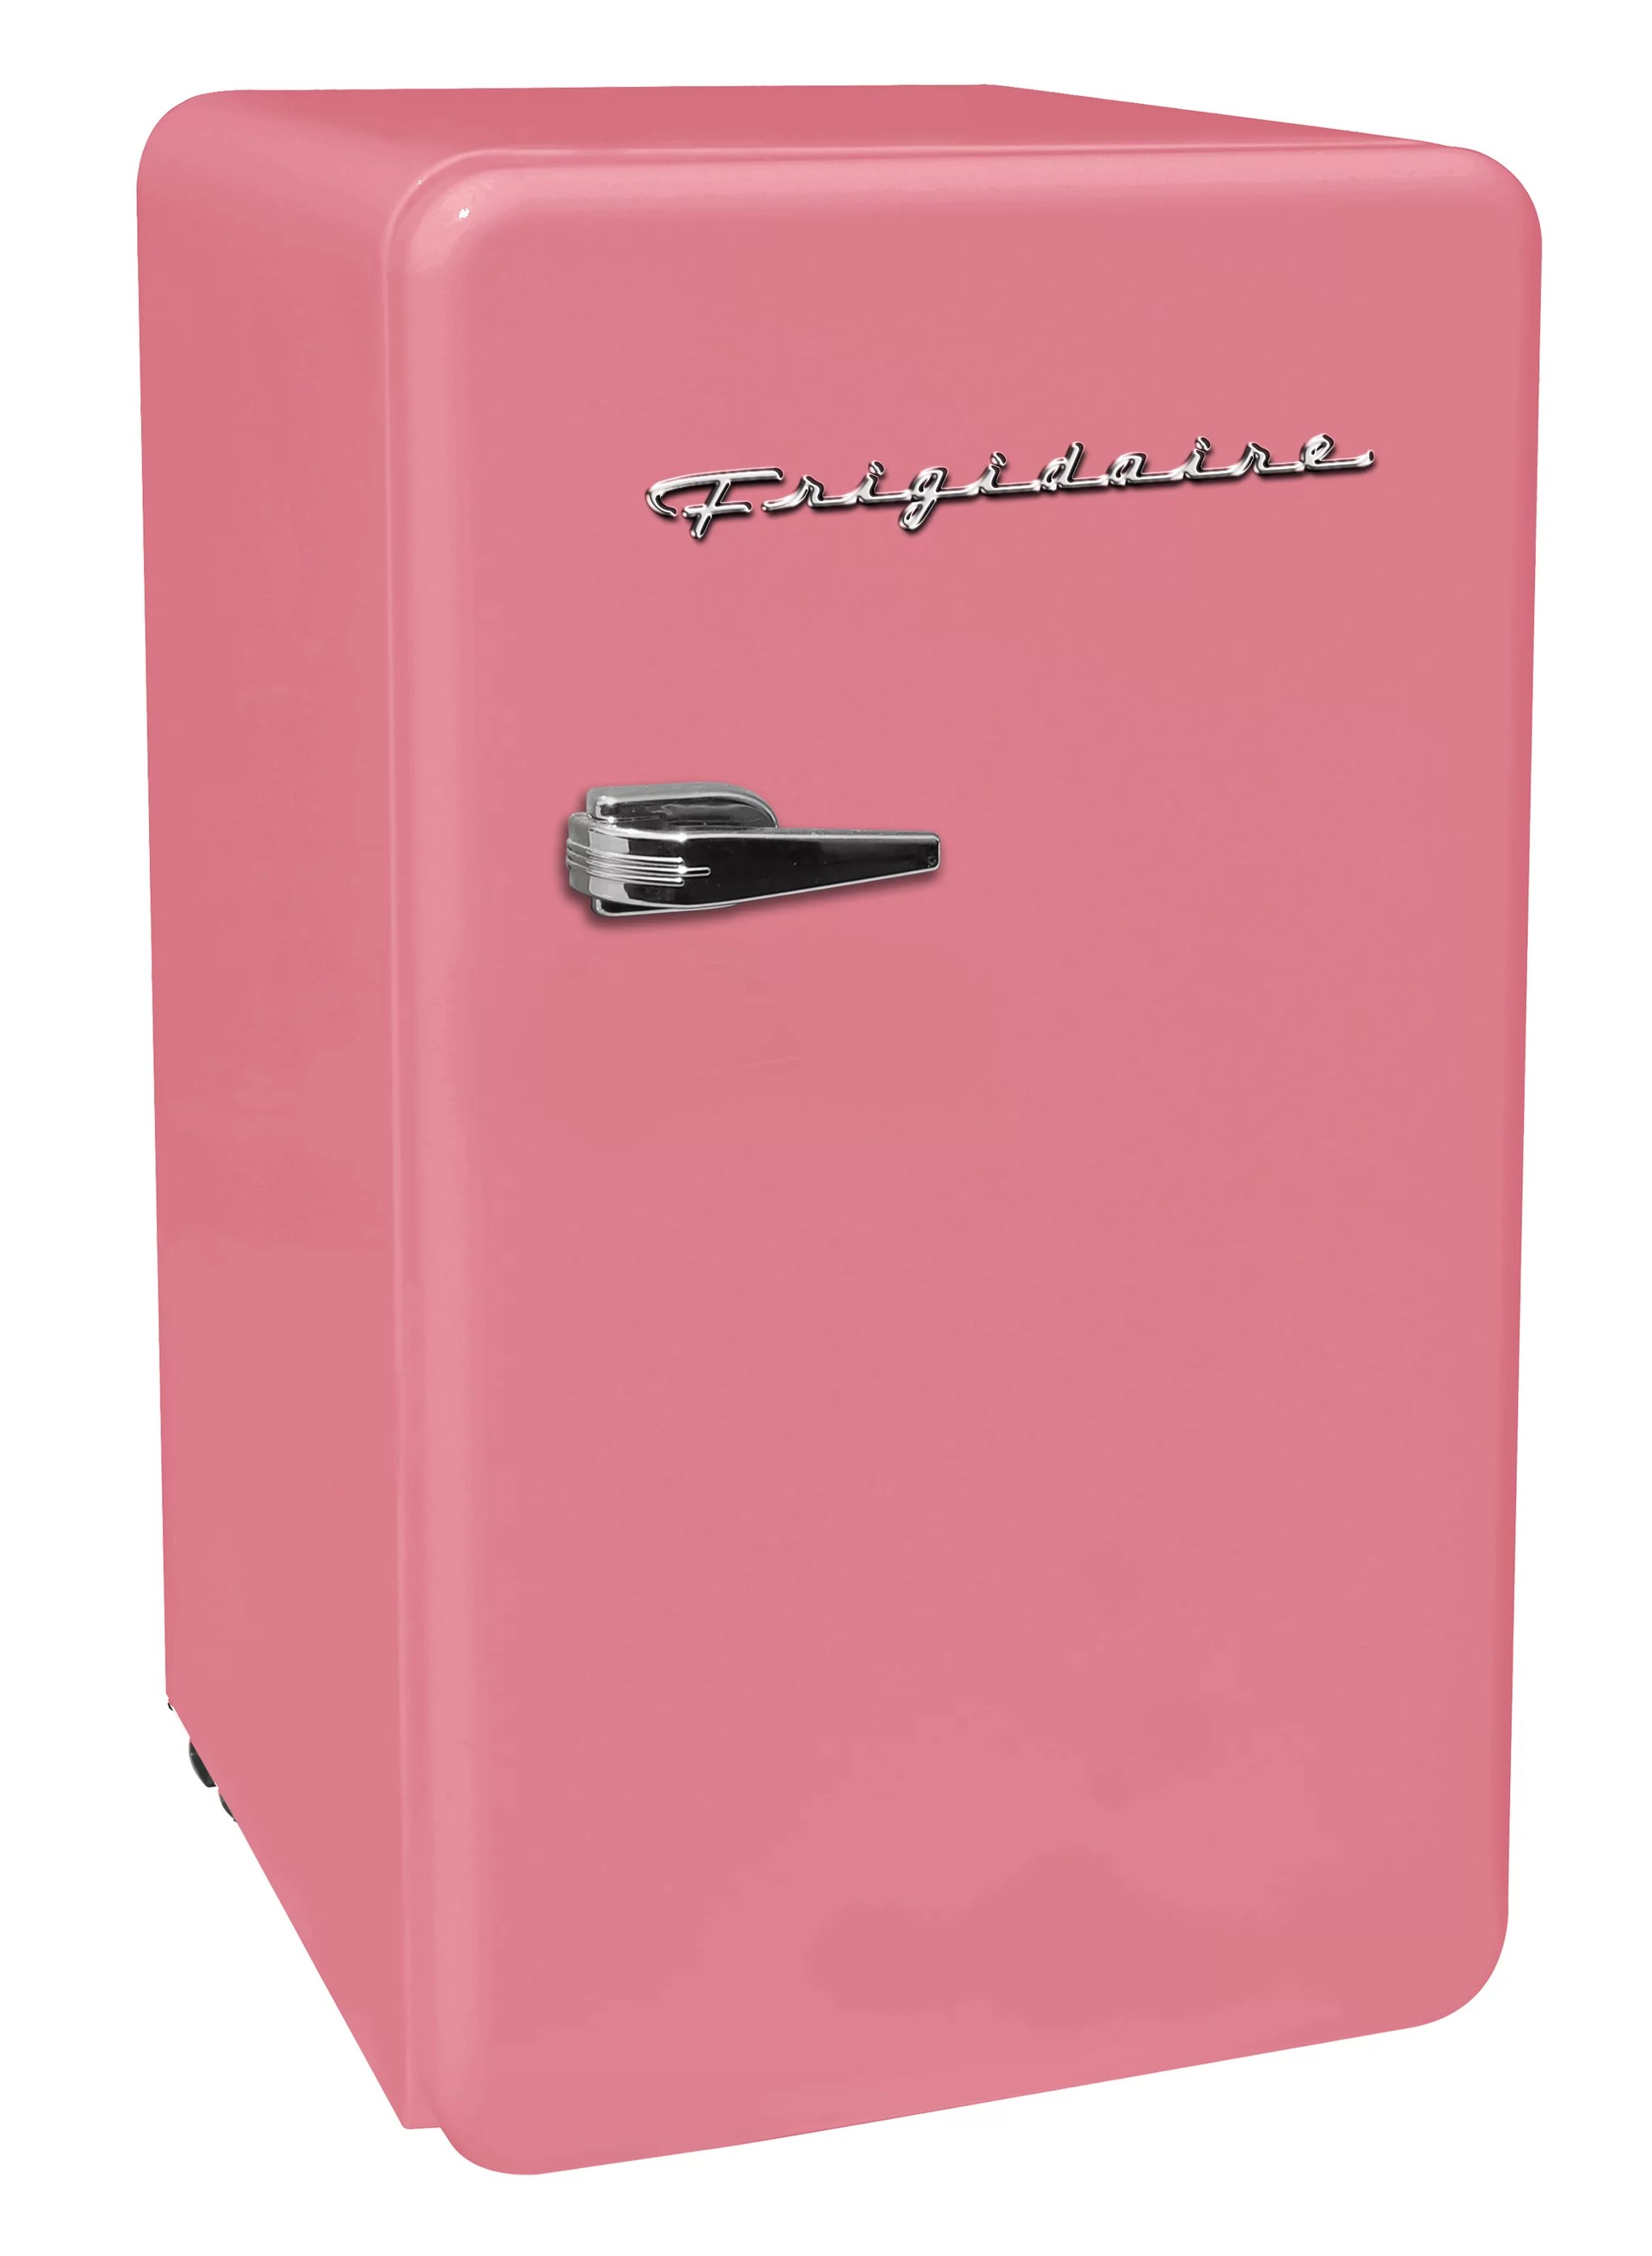 cute dorm room mini fridges popsugar home